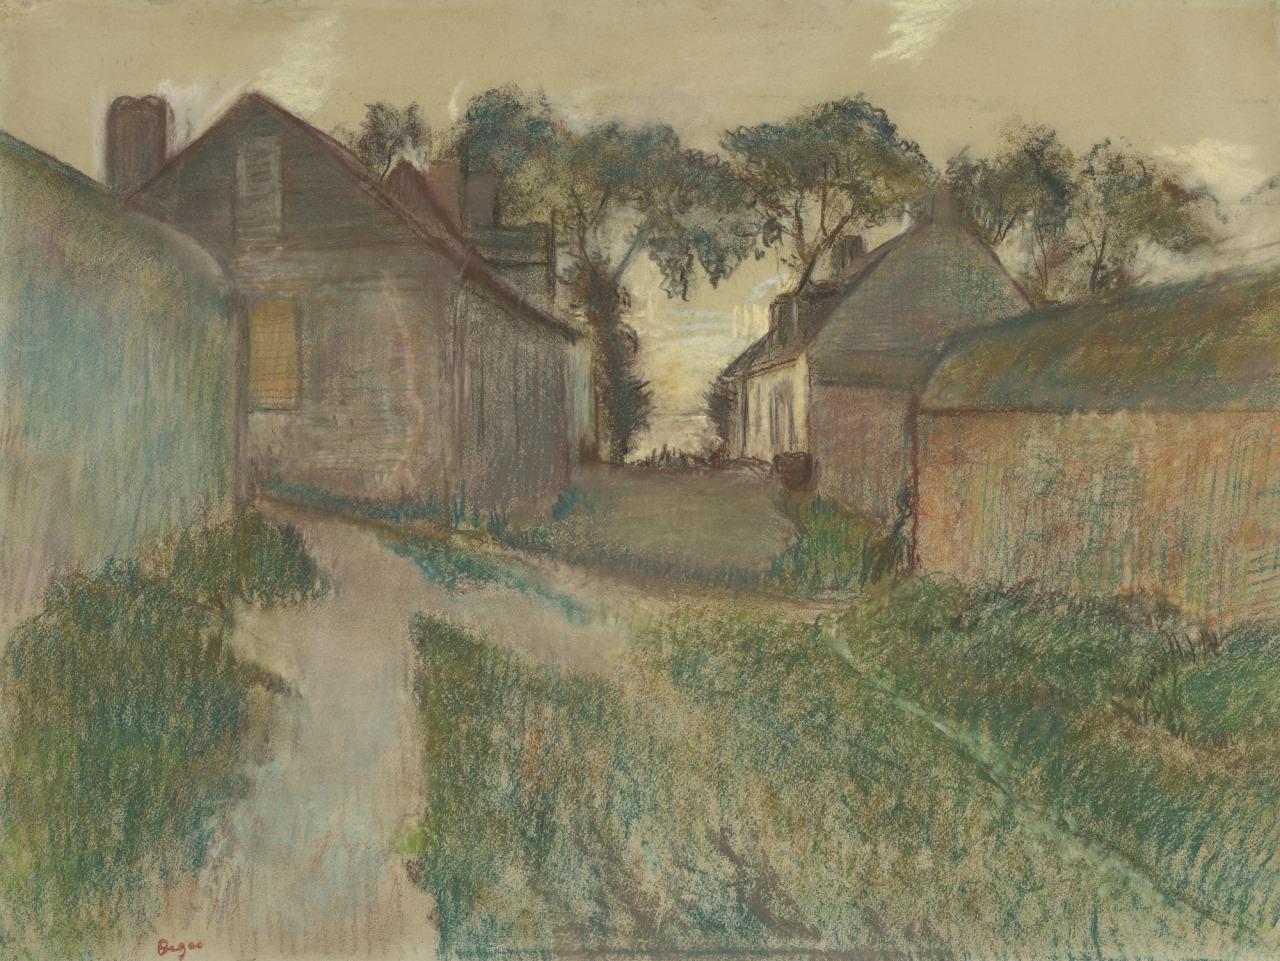 thunderstruck9: Edgar Degas (French, 1834-1917), La Rue Quesnoy, Saint-Valéry-sur-Somme, c.1895-98. Pastel on paper, 48.7 x 64.5 cm.